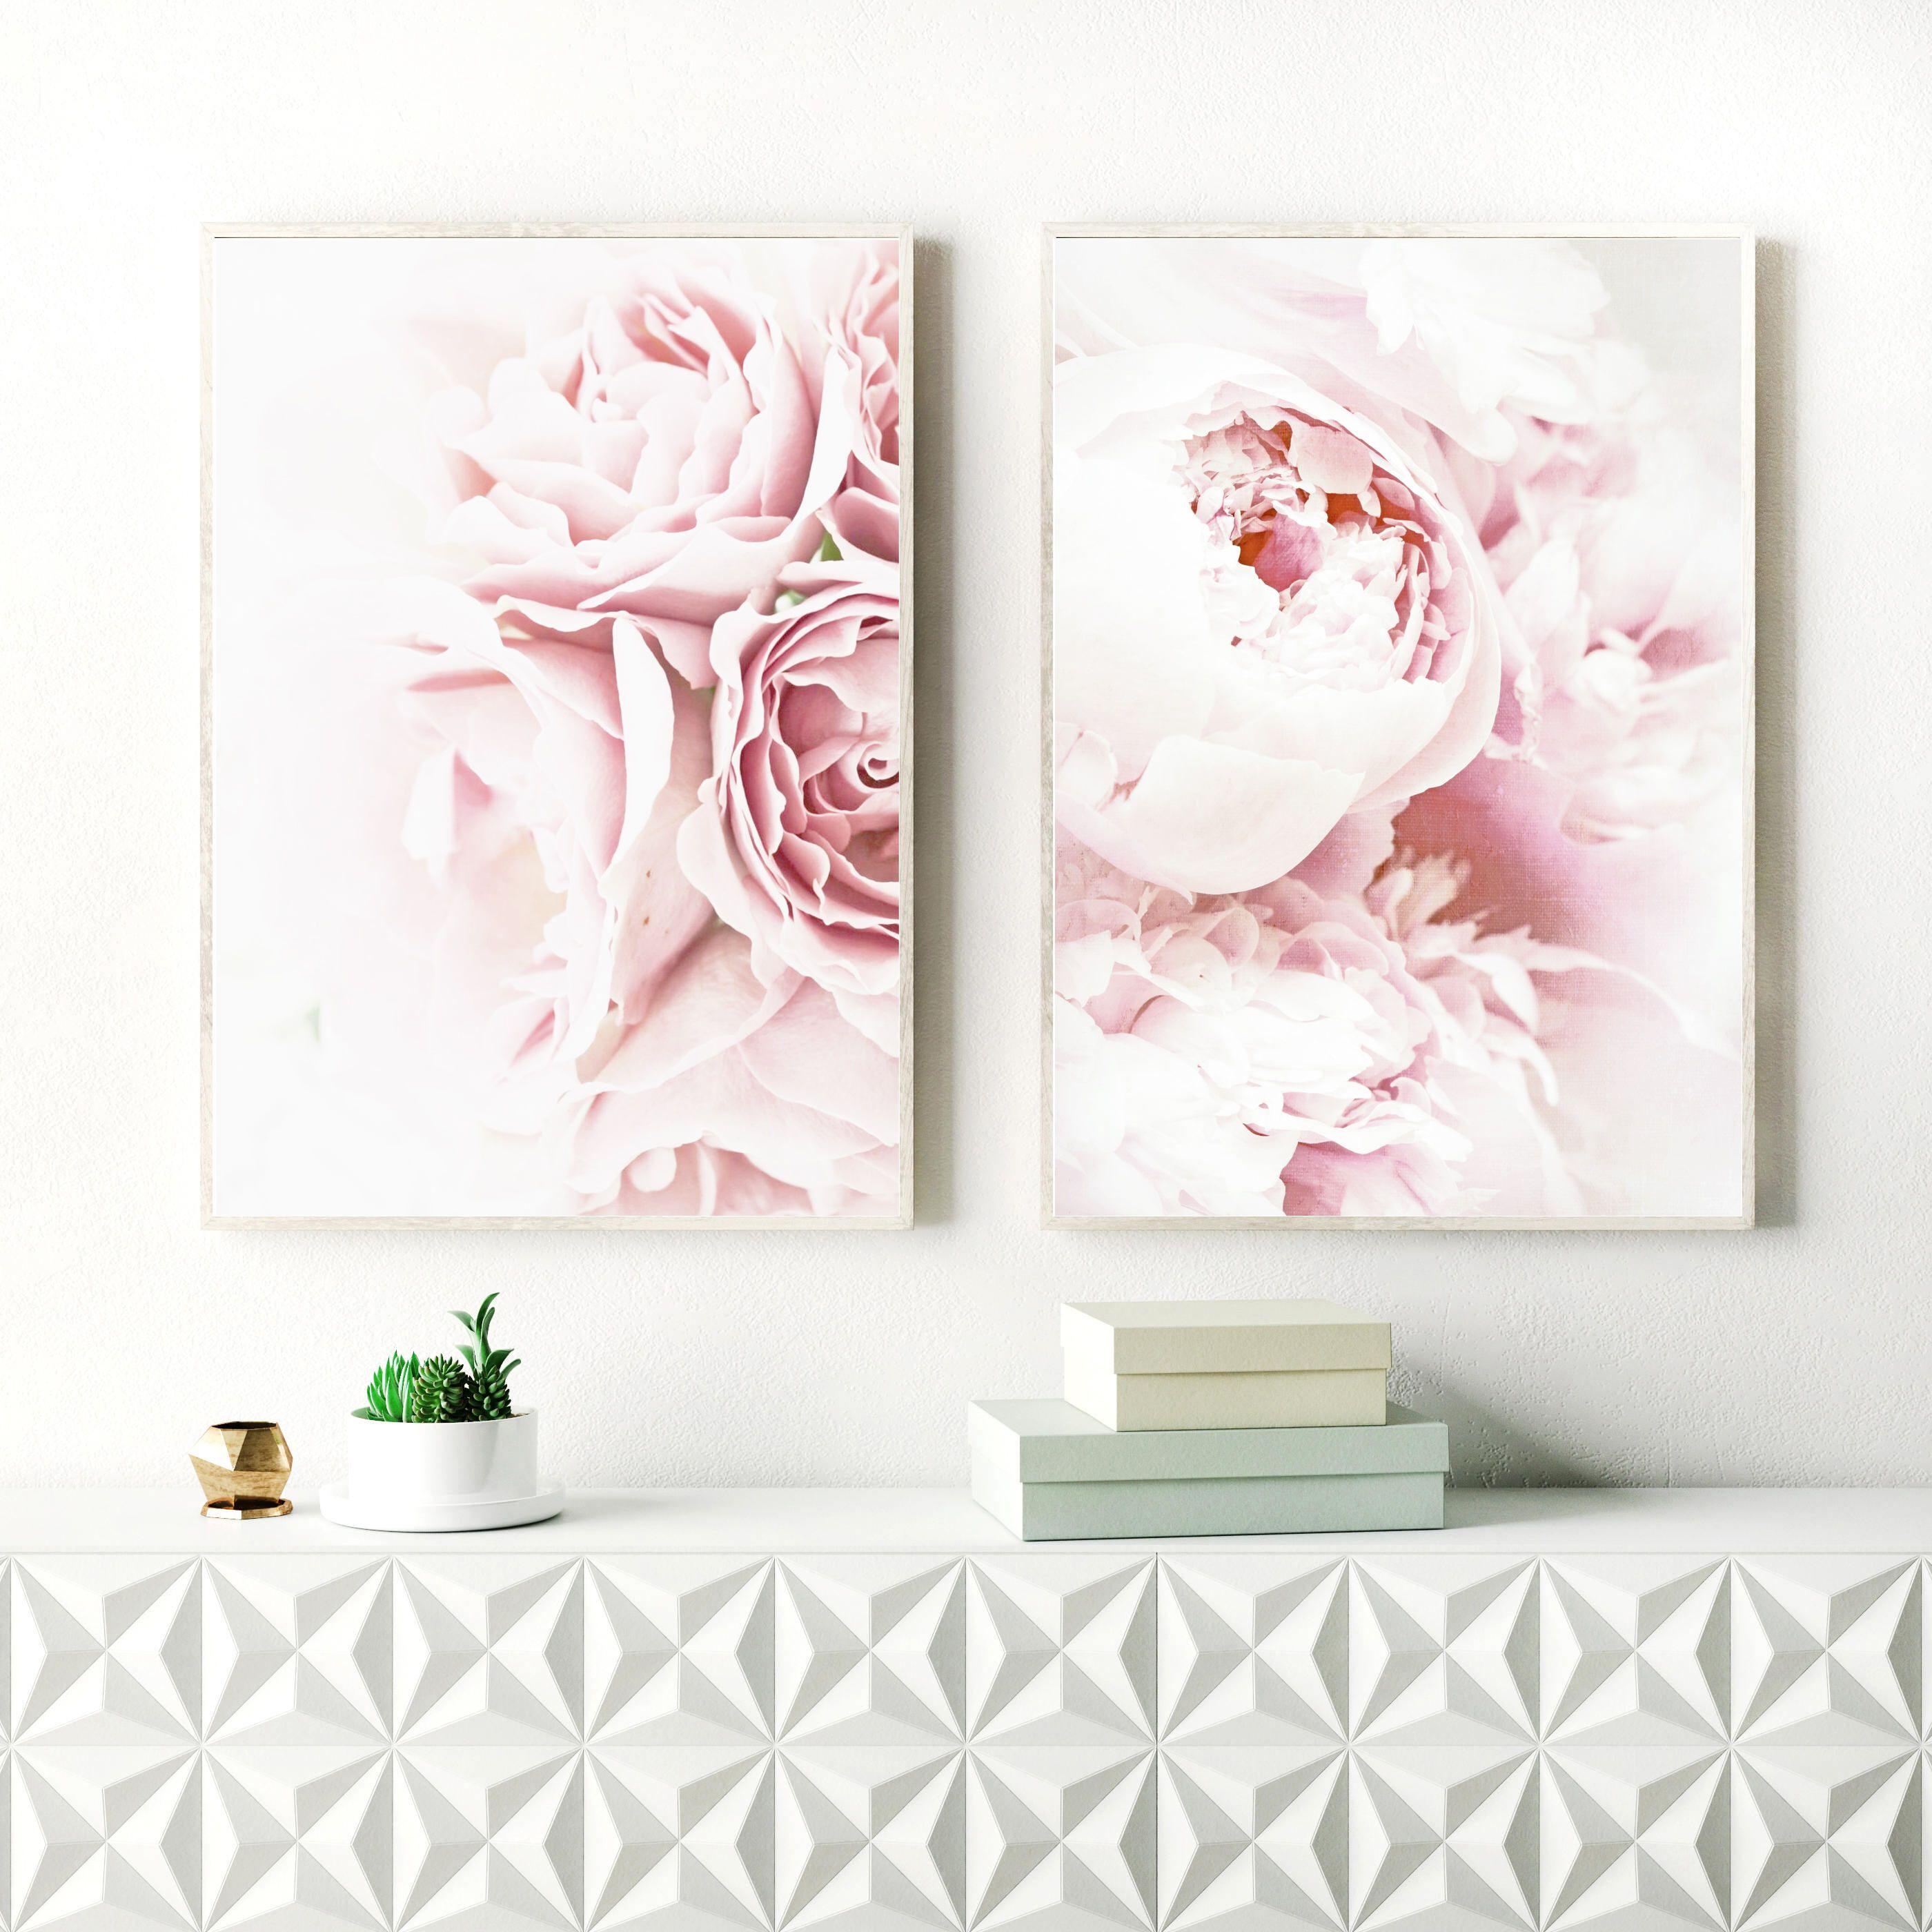 Peony Print, Flower Print Sets for Nursery, Kids Room, Nursery Decor,  Floral Print, Botanical Poster, Nursery Wall Art, Flower Wall Decor